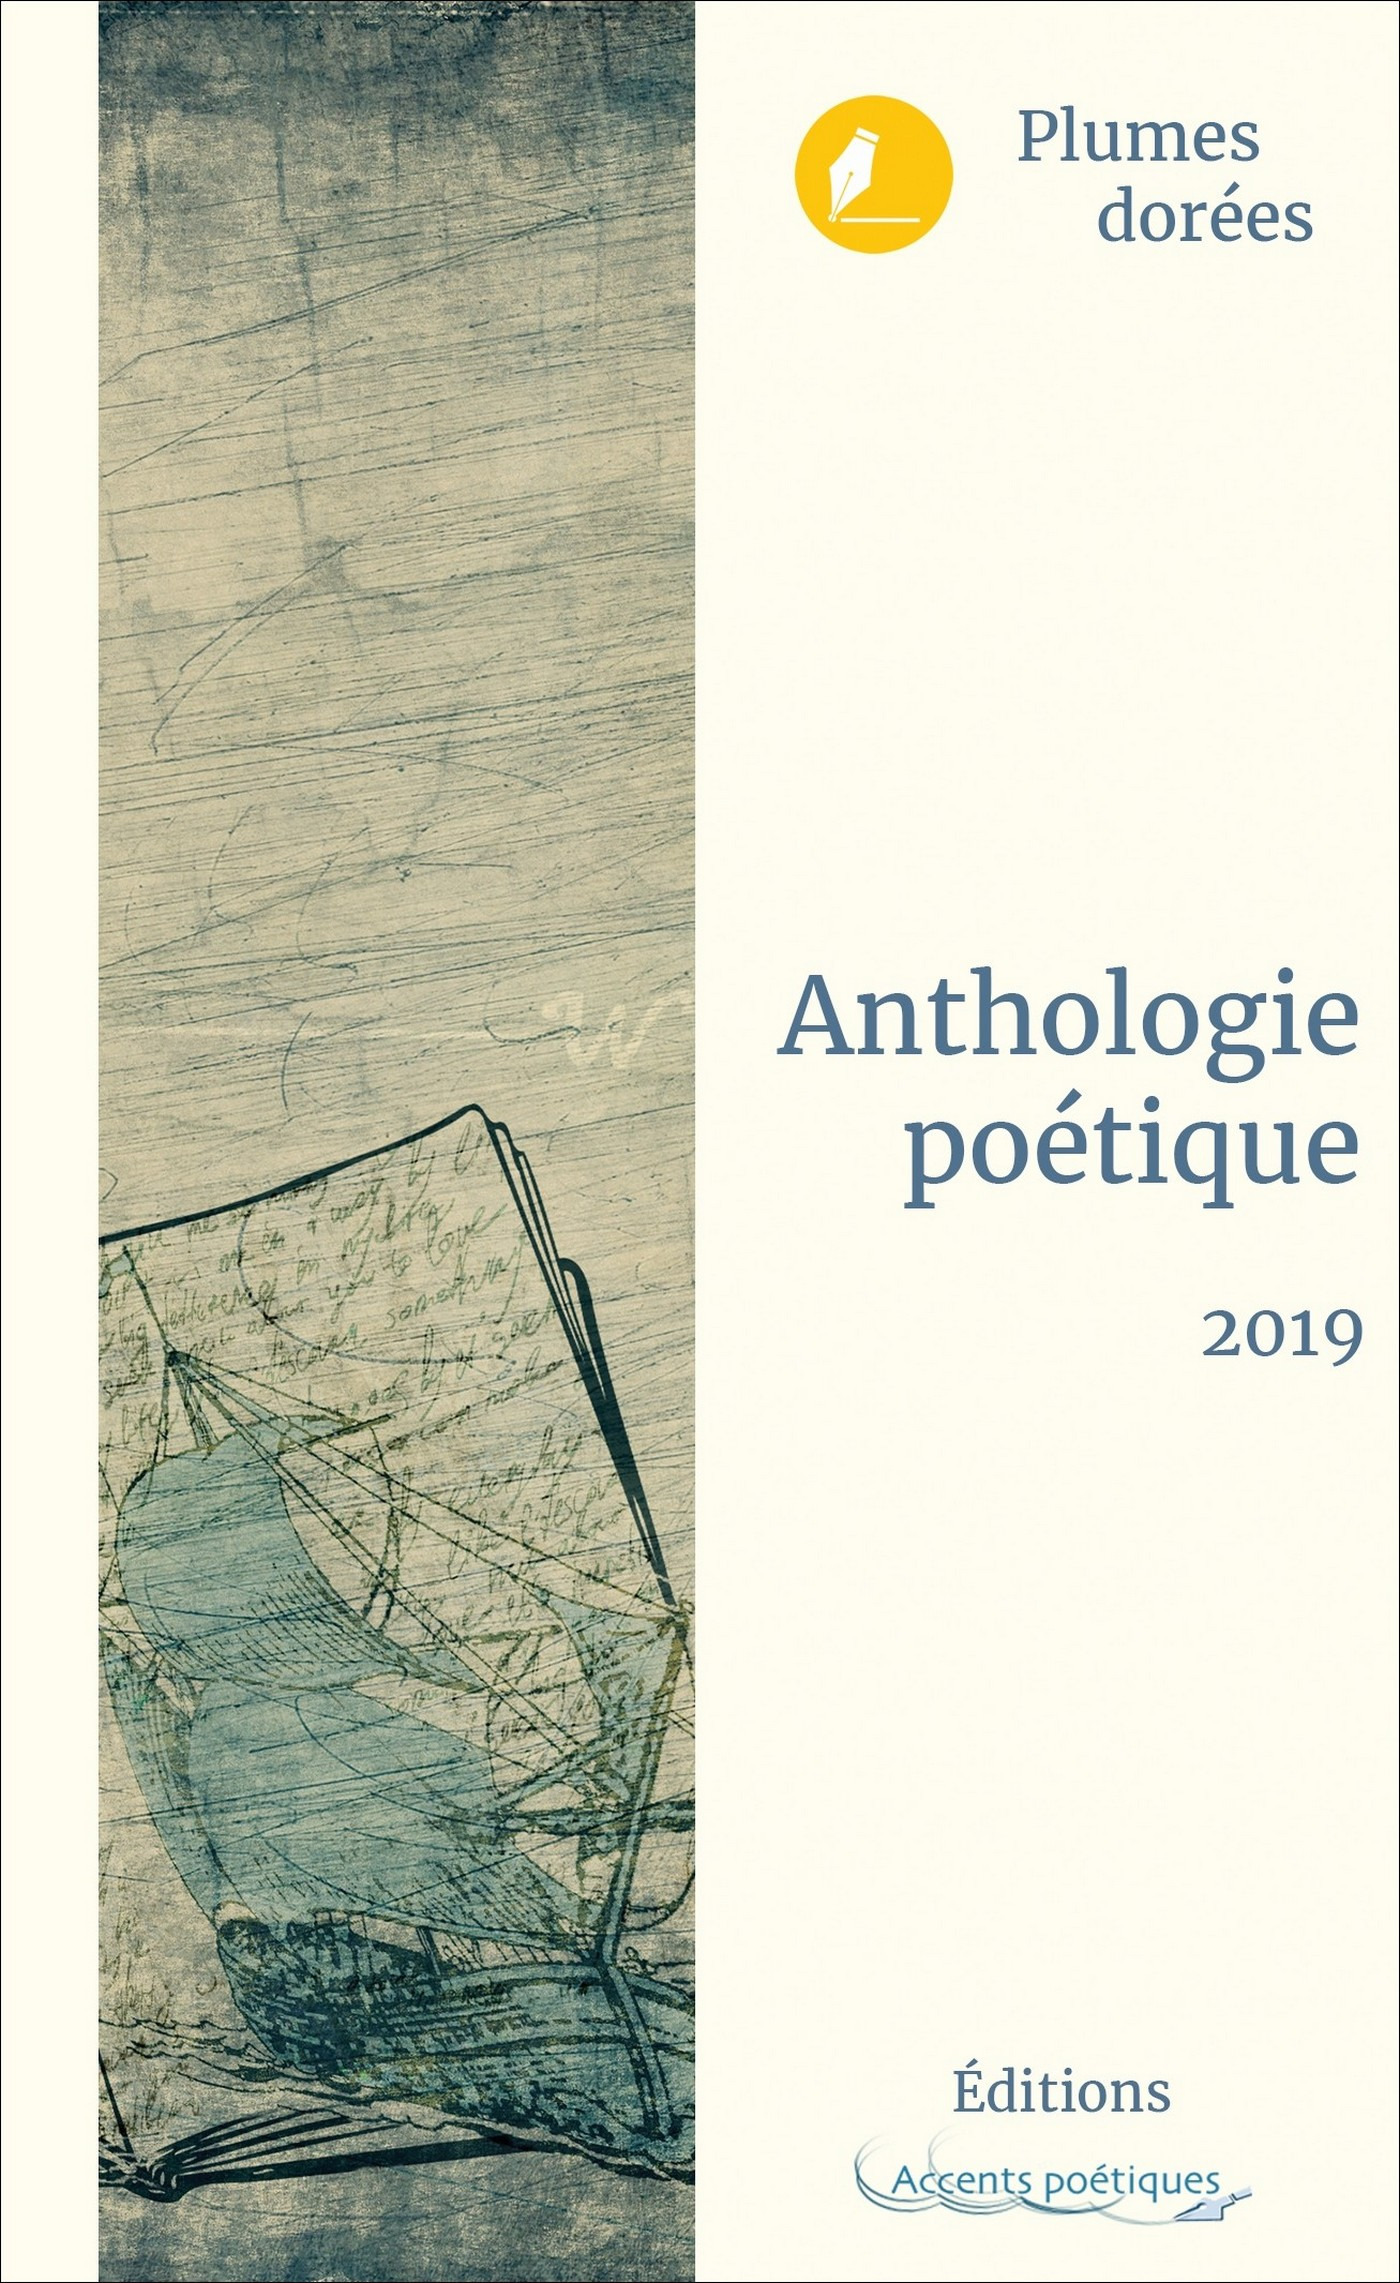 Anthologie poétique 2019